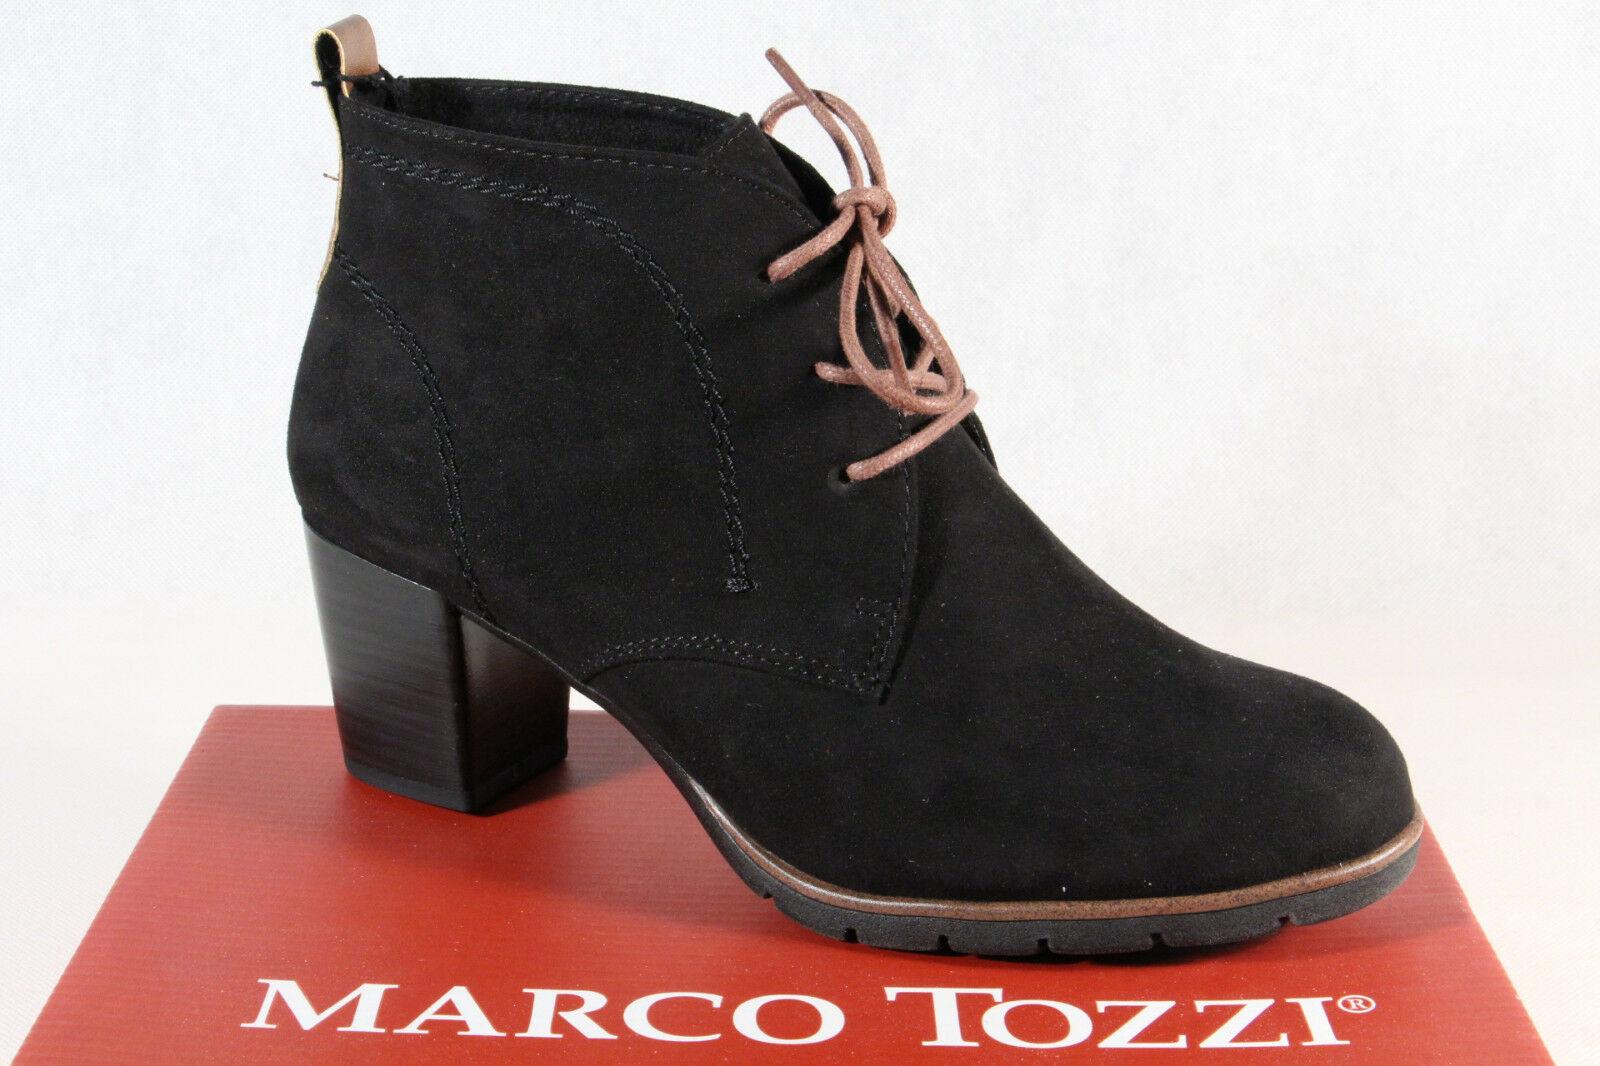 57bc5dff4384 Marco Tozzi Stiefel Stiefelette Boots Winterstiefel schwarz 25107 NEU!!